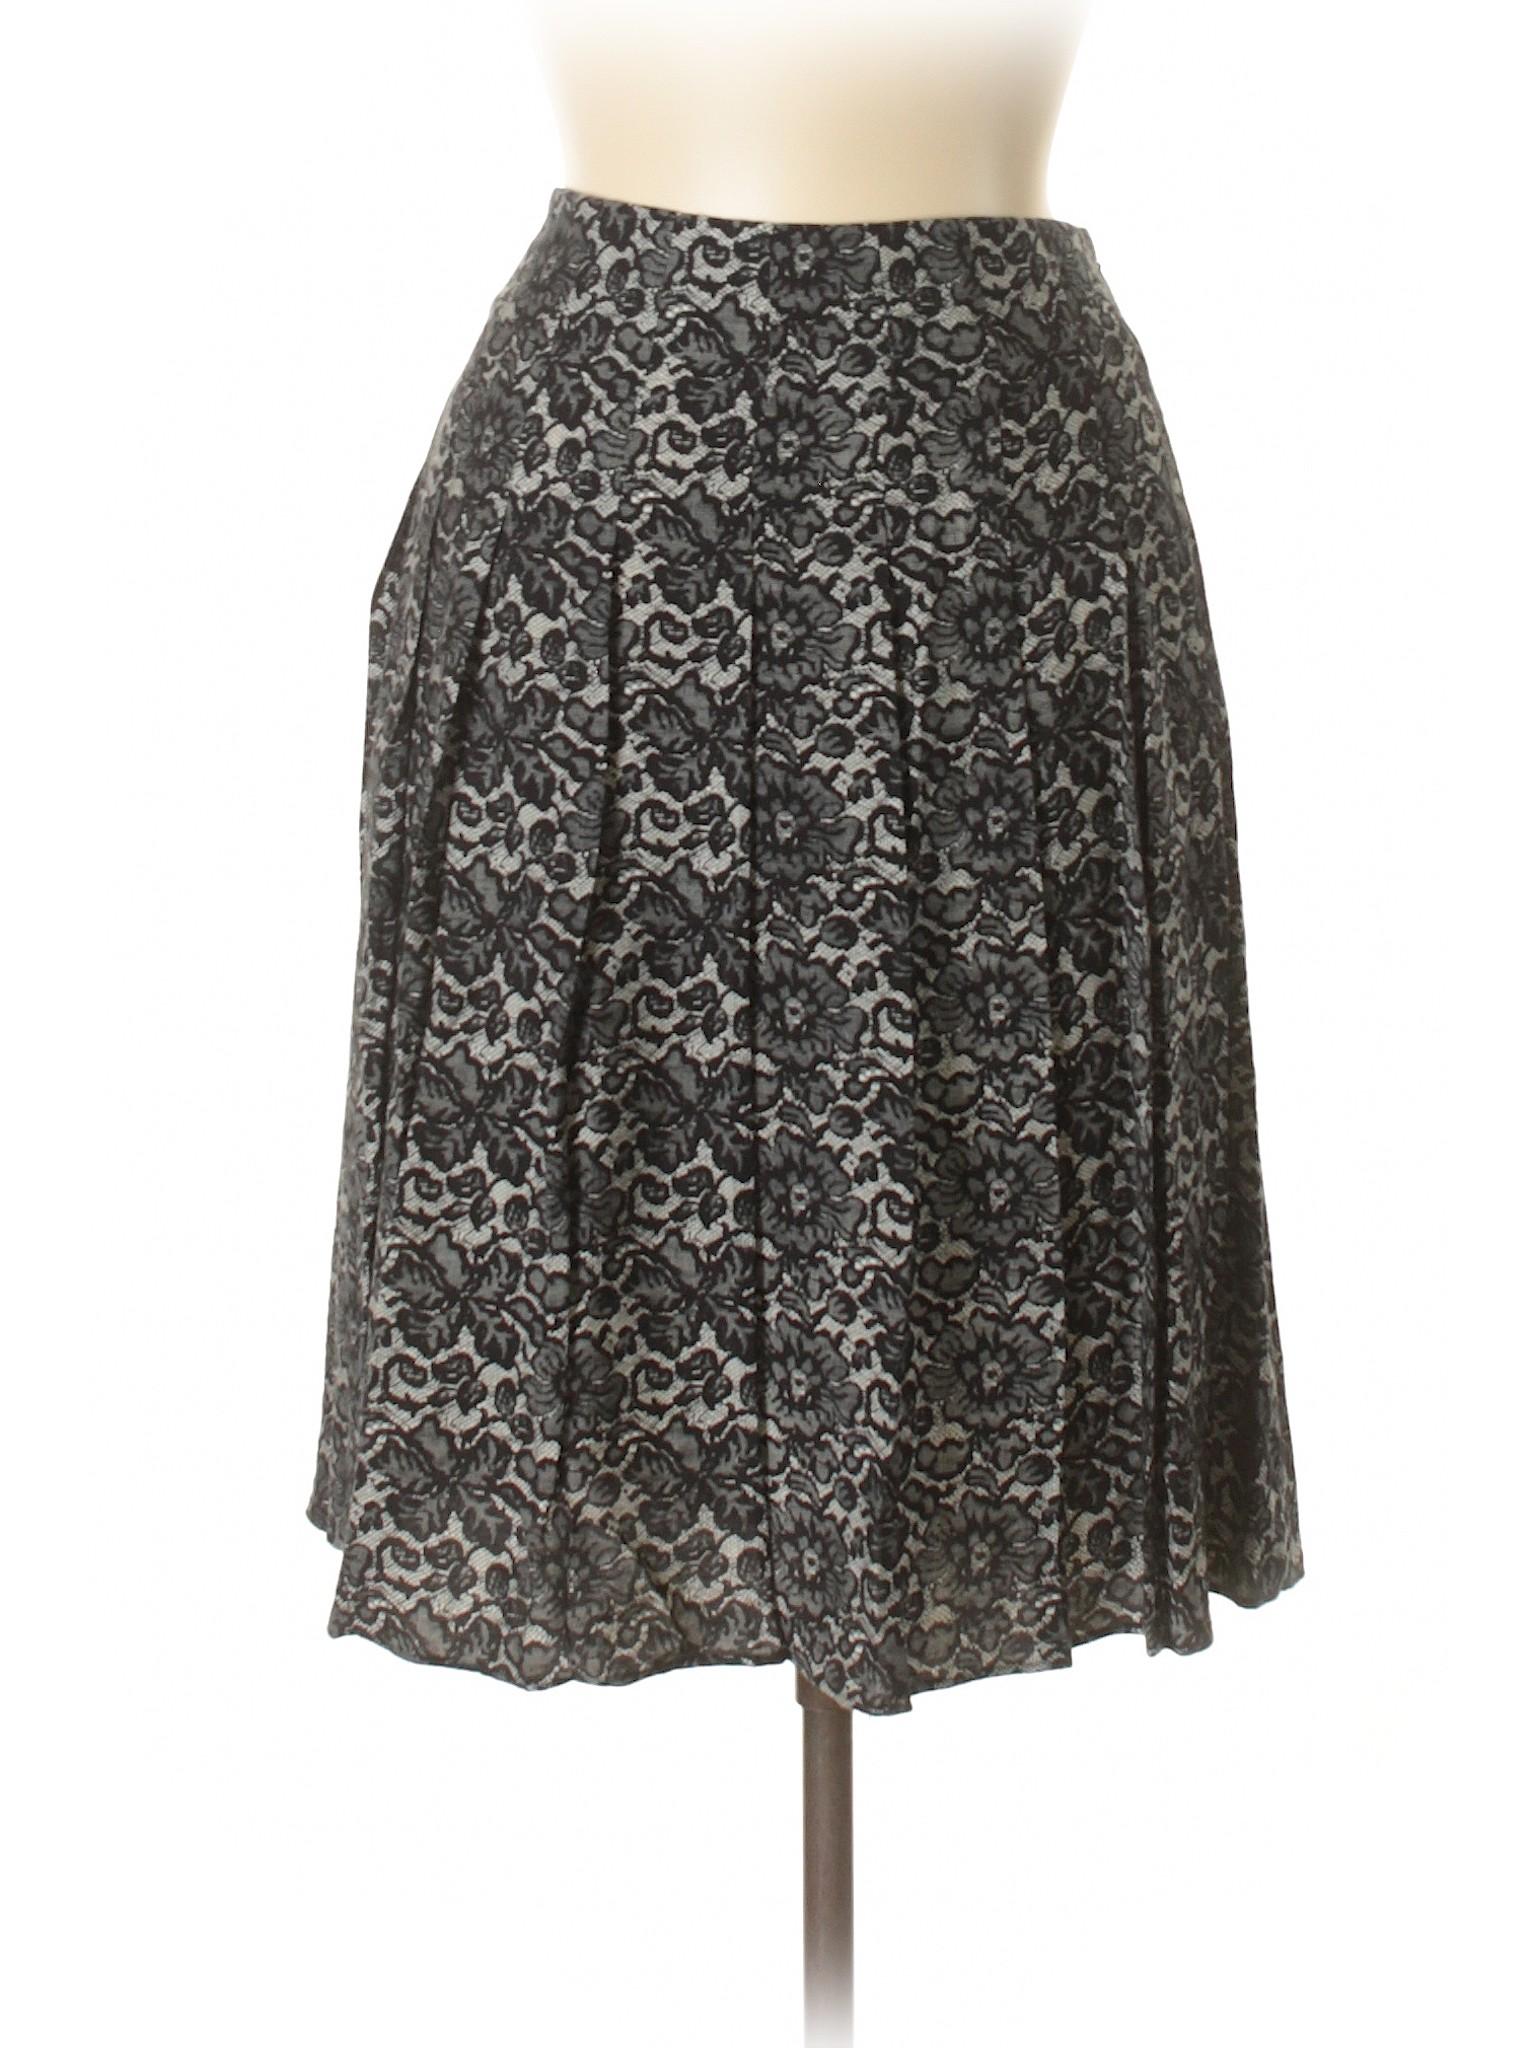 Boutique Skirt Casual Boutique Boutique Casual Boutique Skirt Skirt Boutique Casual Casual Skirt HdnRSdAPq